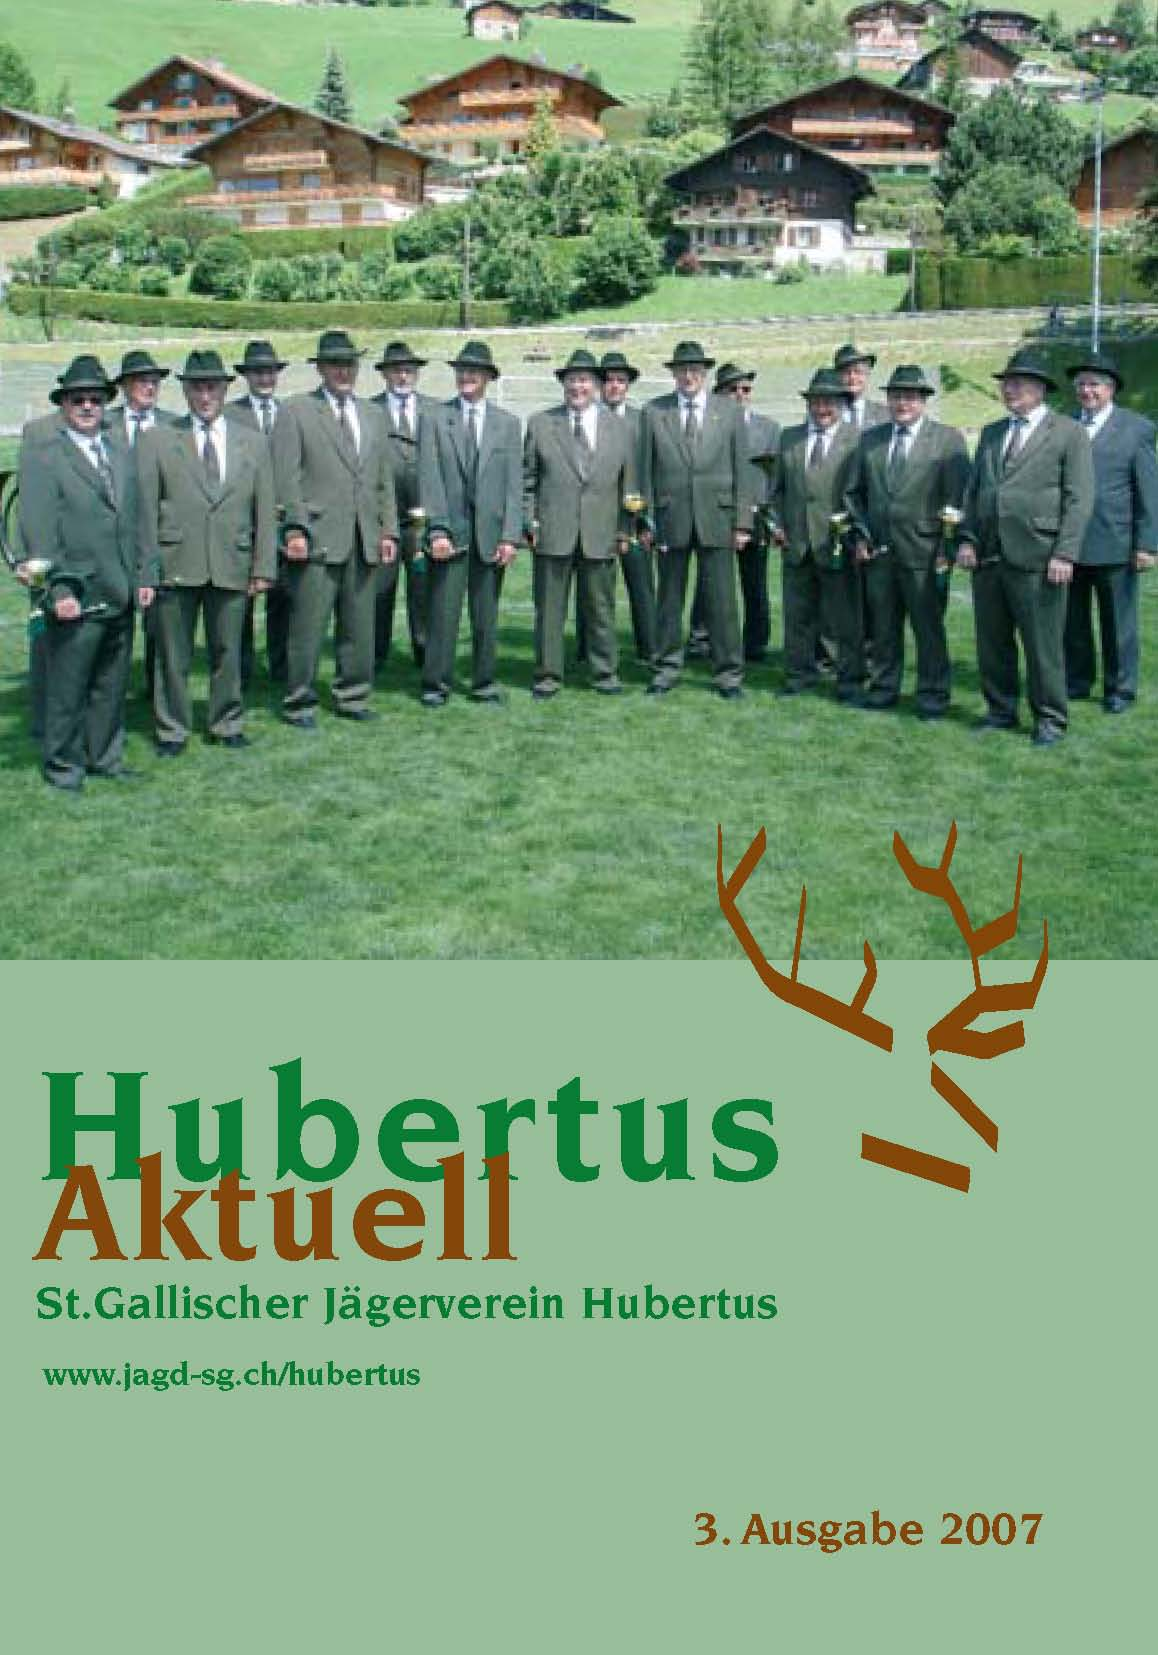 hubertus akutell 03 2007